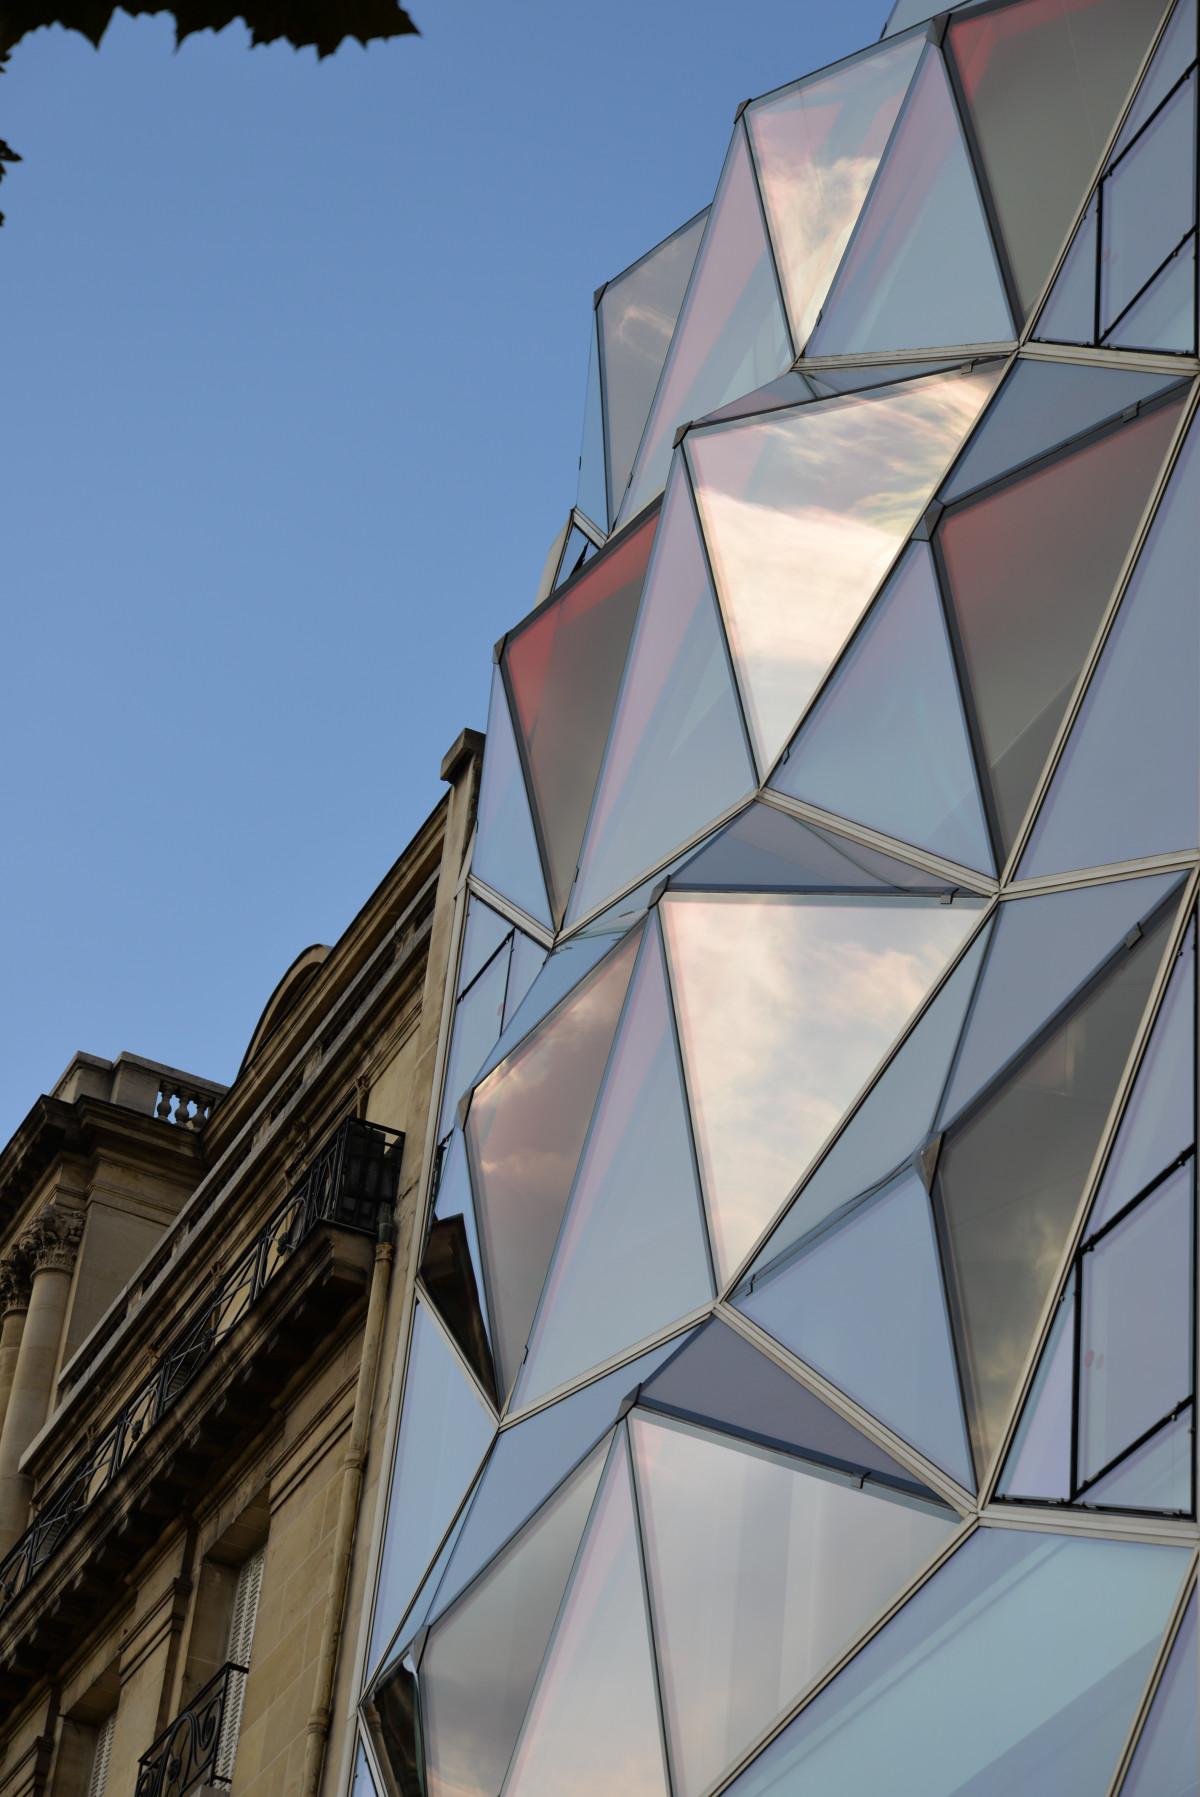 Free Images Glass Concrete Symmetry Windows Modern